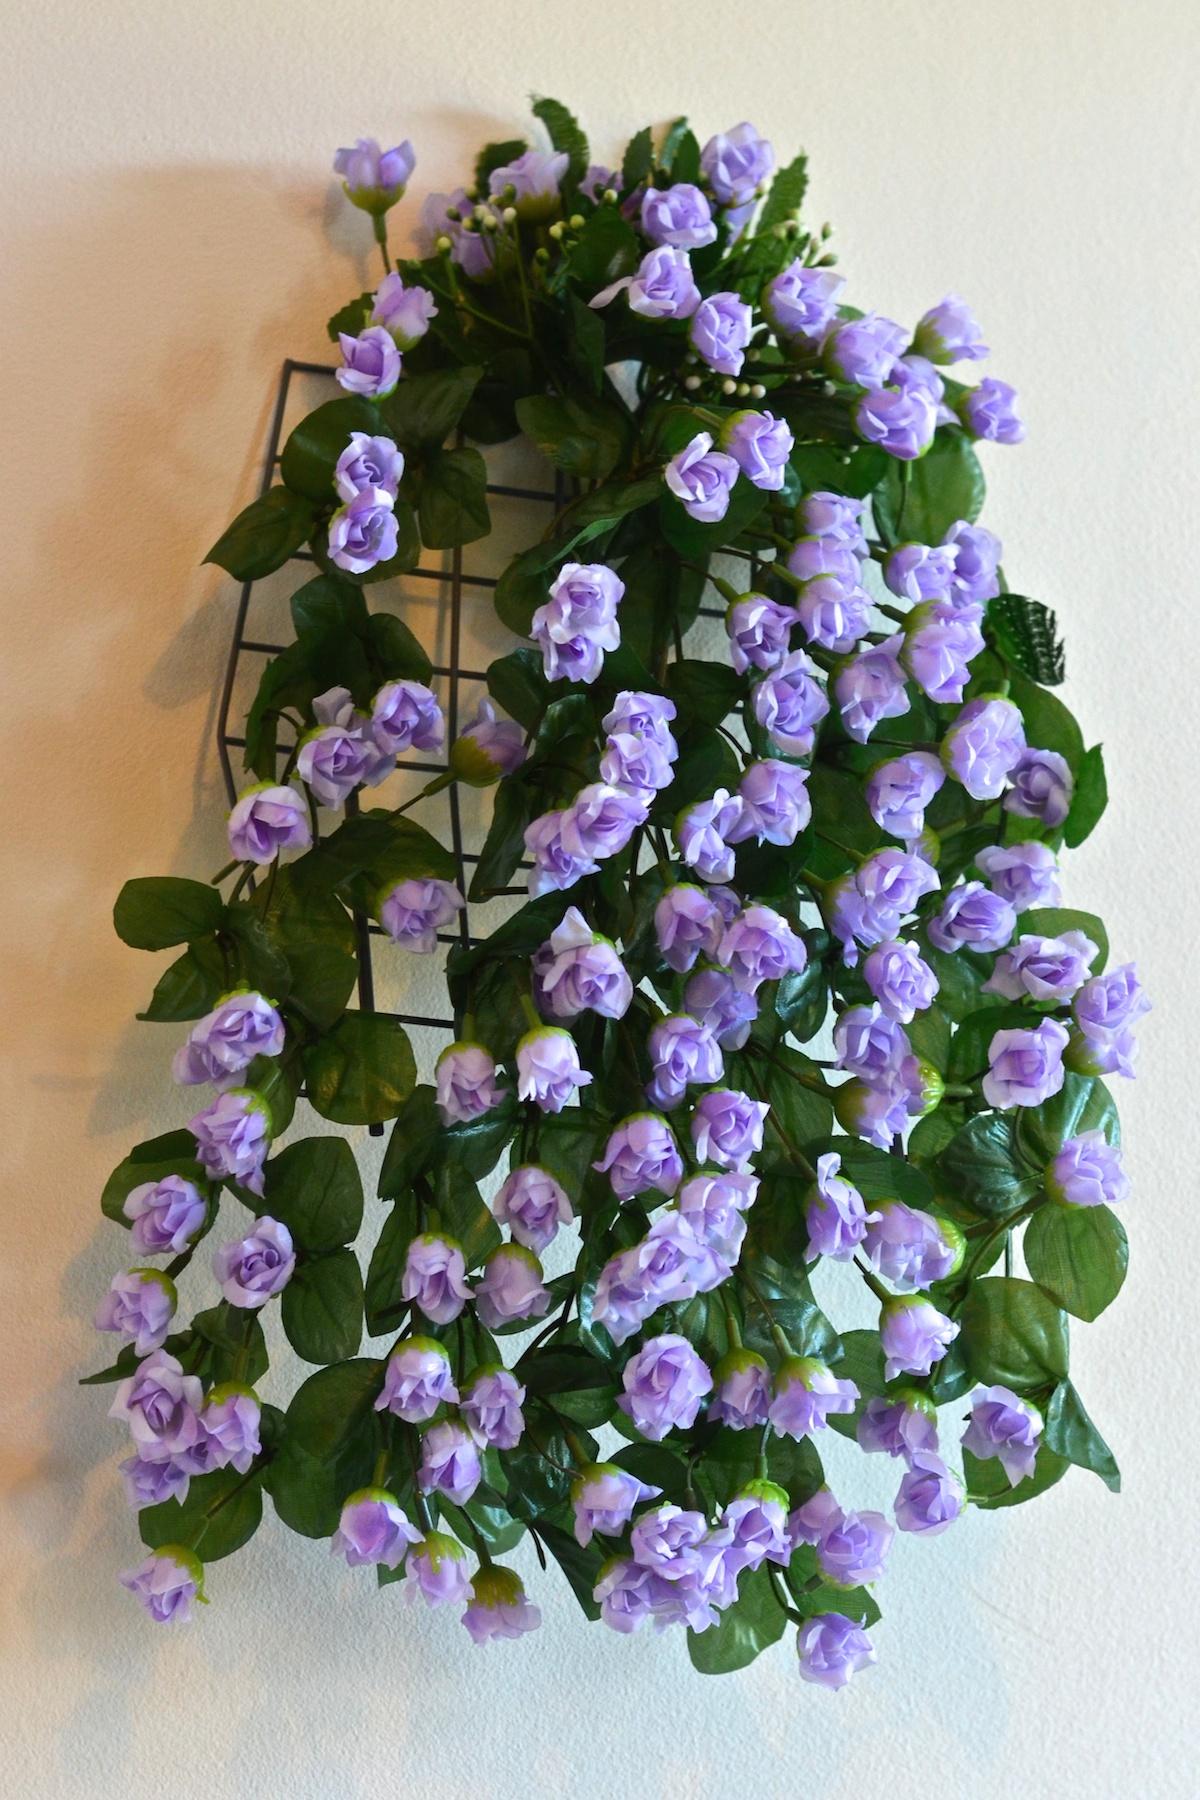 57cm rosenranke kunstpflanzen dekoration efeugirlande Dekoration blumen